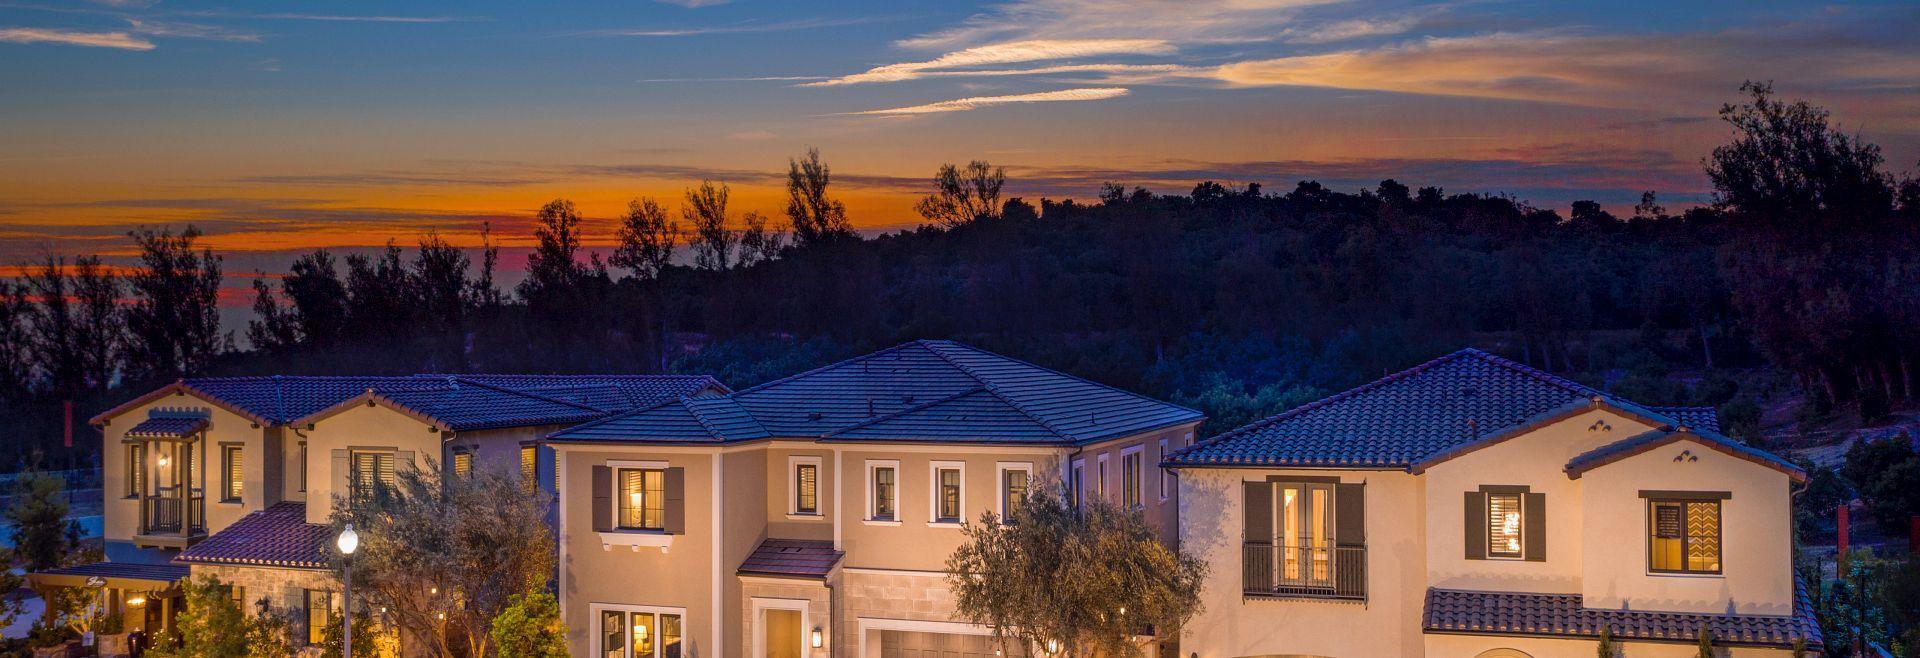 'Cetara at Orchard Hills' by Shea Homes - Family - Southern California in Orange County